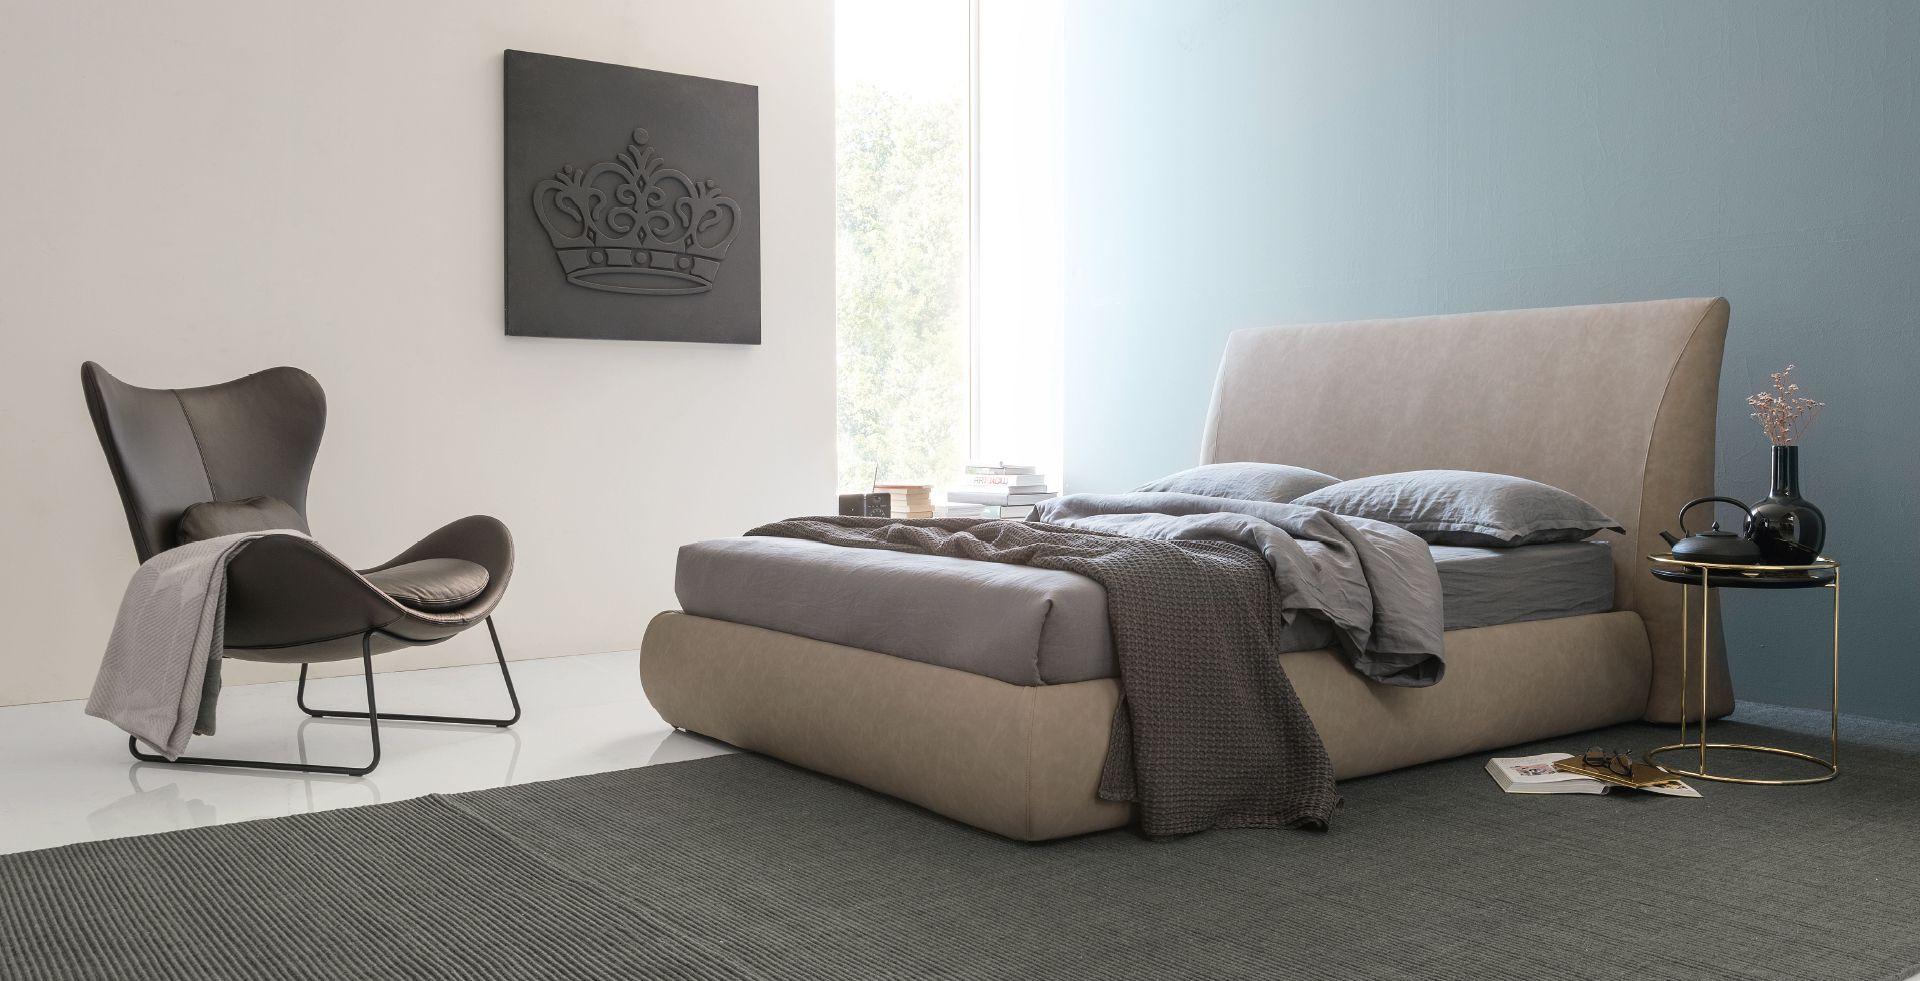 Michigan bed calligaris calligaris bedroom in 2019 - Bedroom furniture stores michigan ...